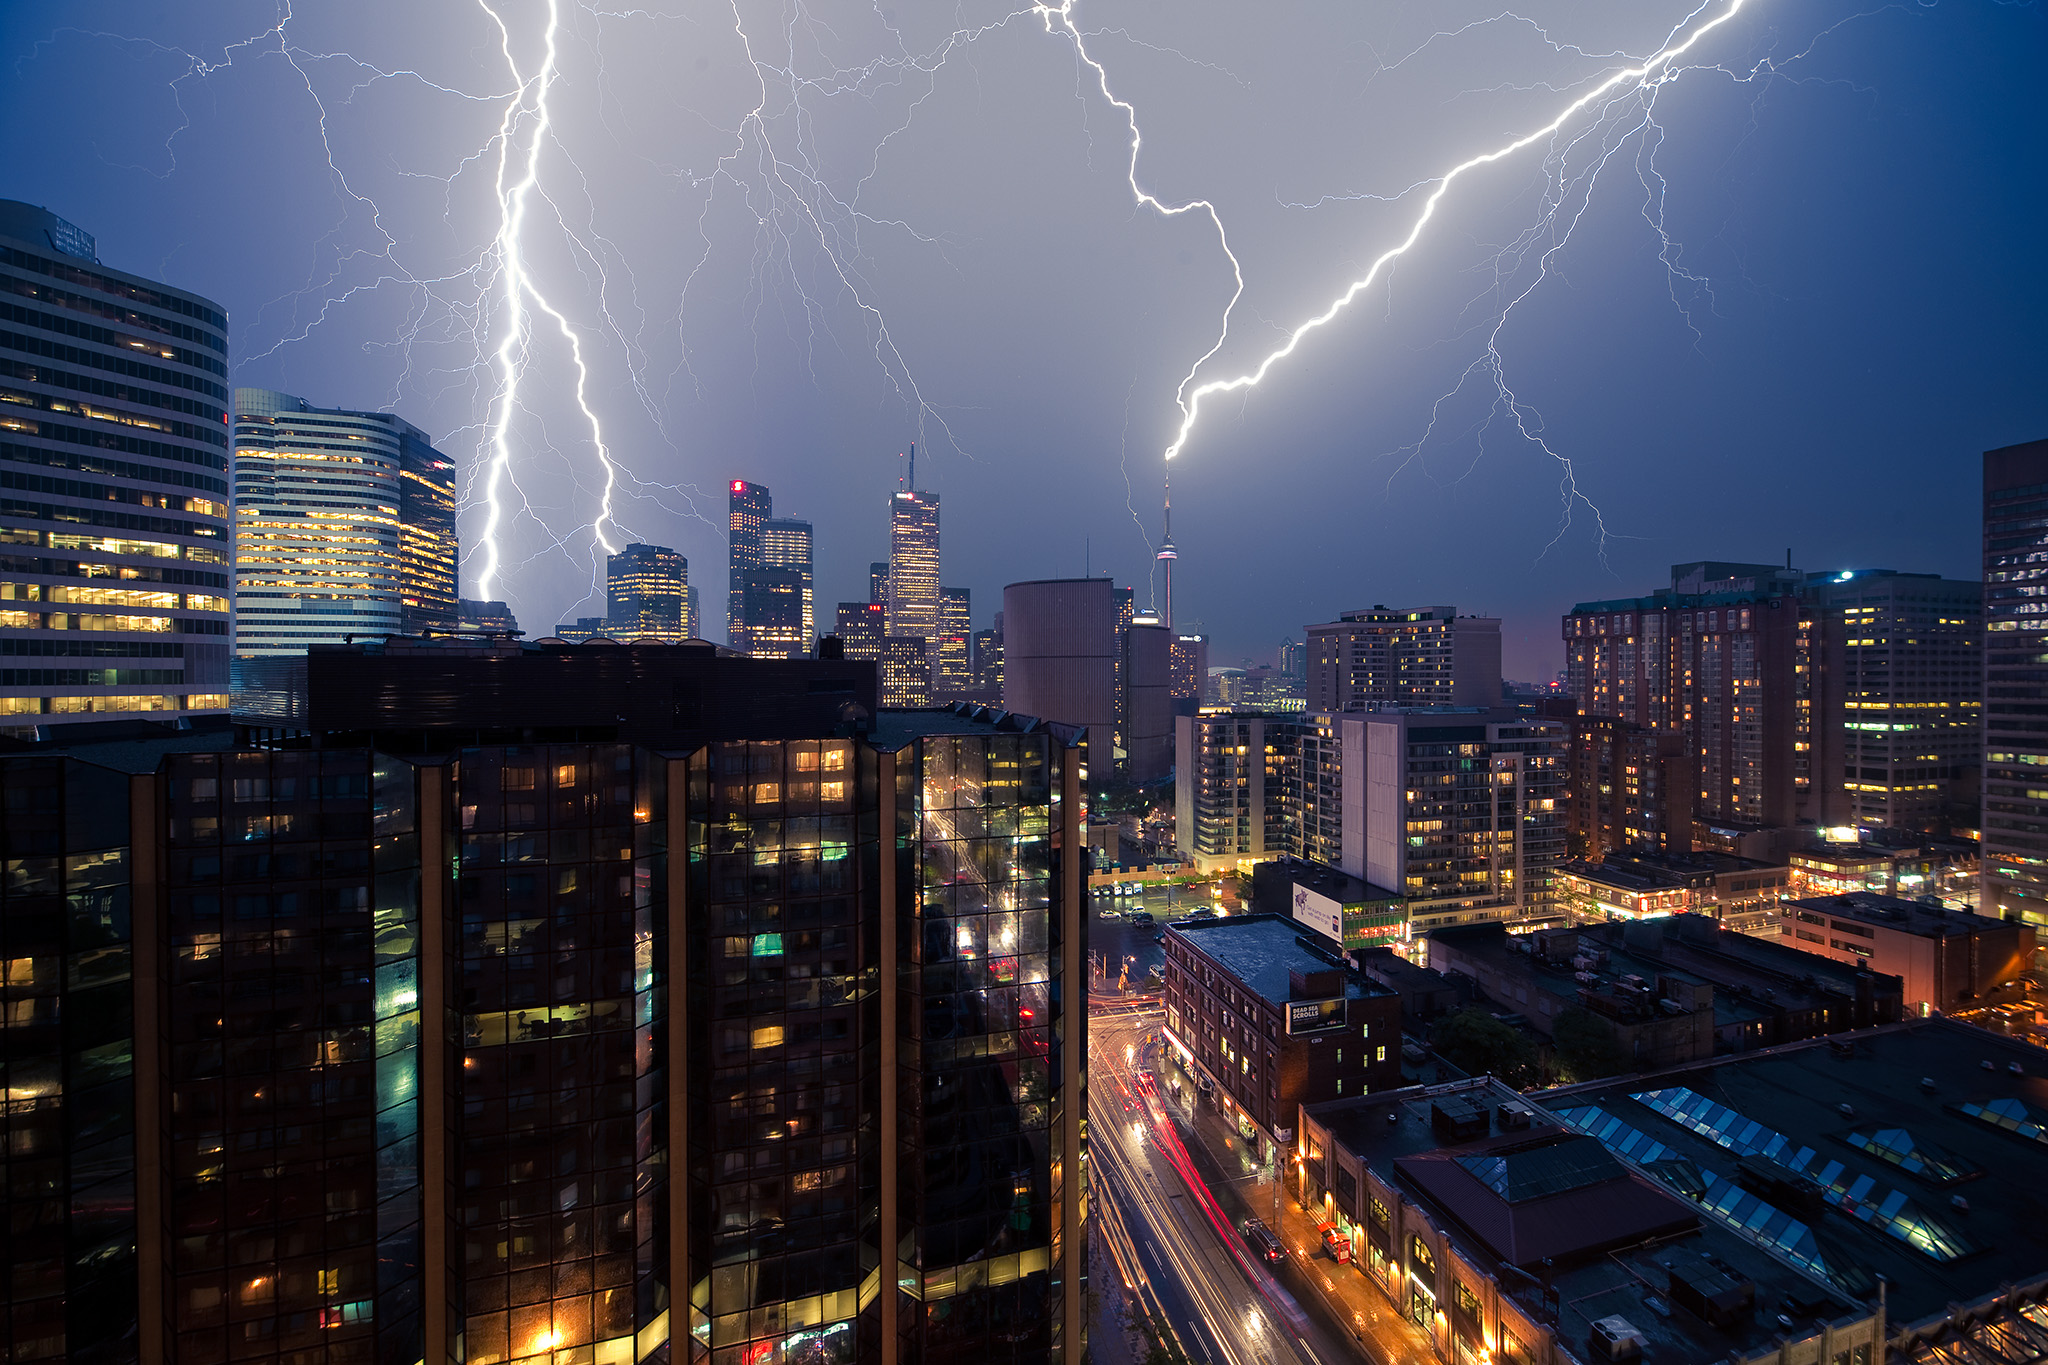 lightning_storm_cn-tower_layers_01.jpg